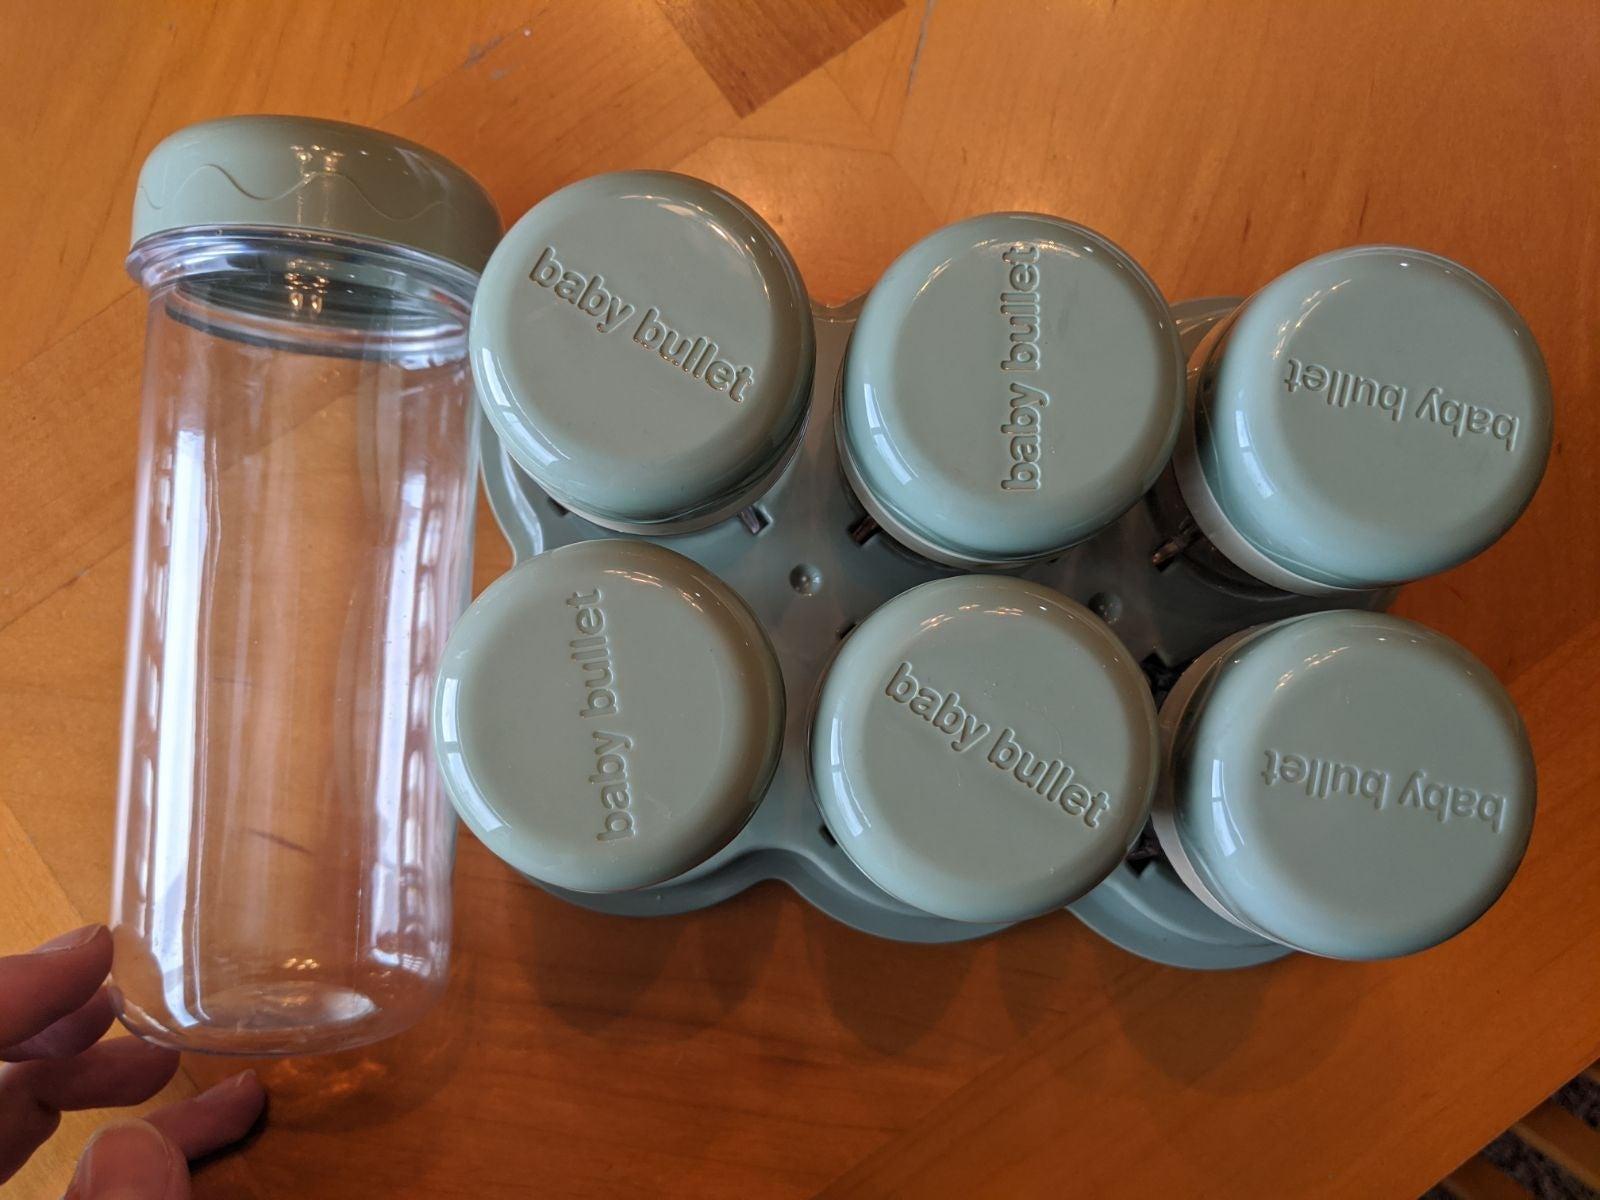 Baby Bullet cups